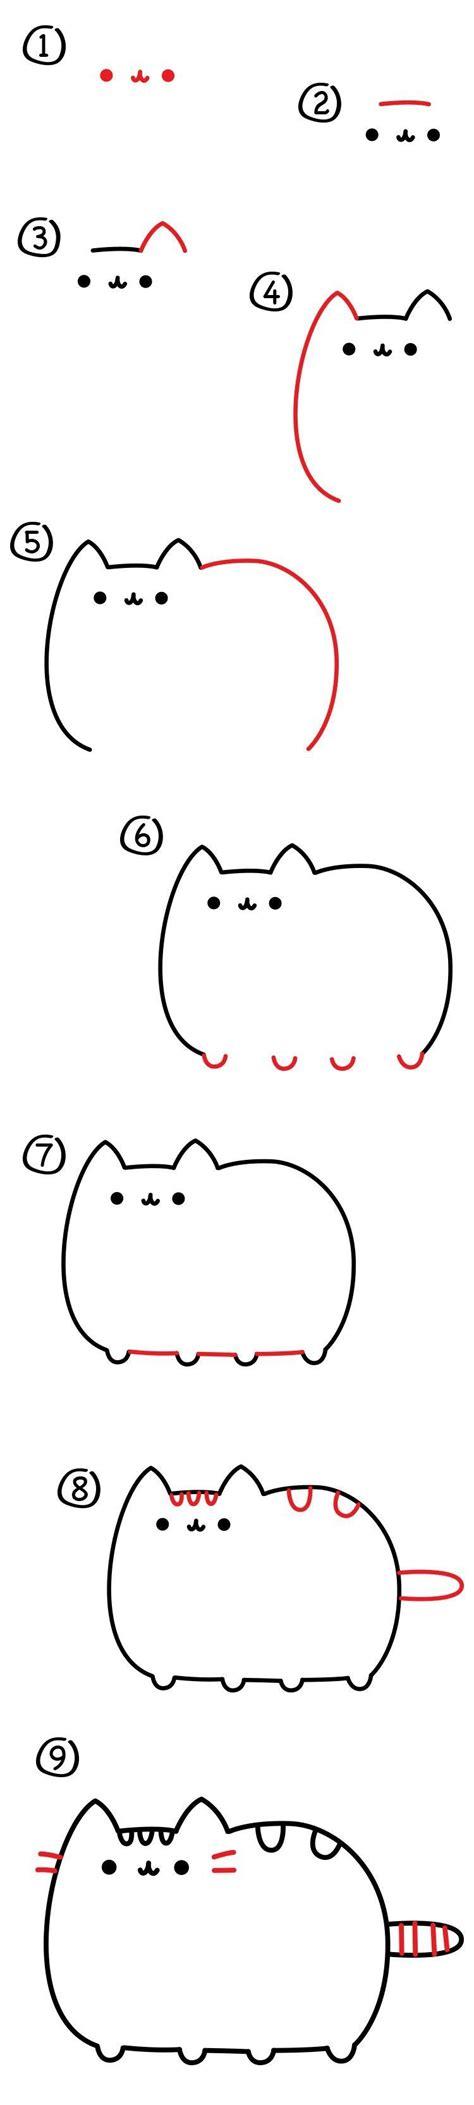 how to draw doodle cat 1 que kawaii paso a paso dibujos pusheen